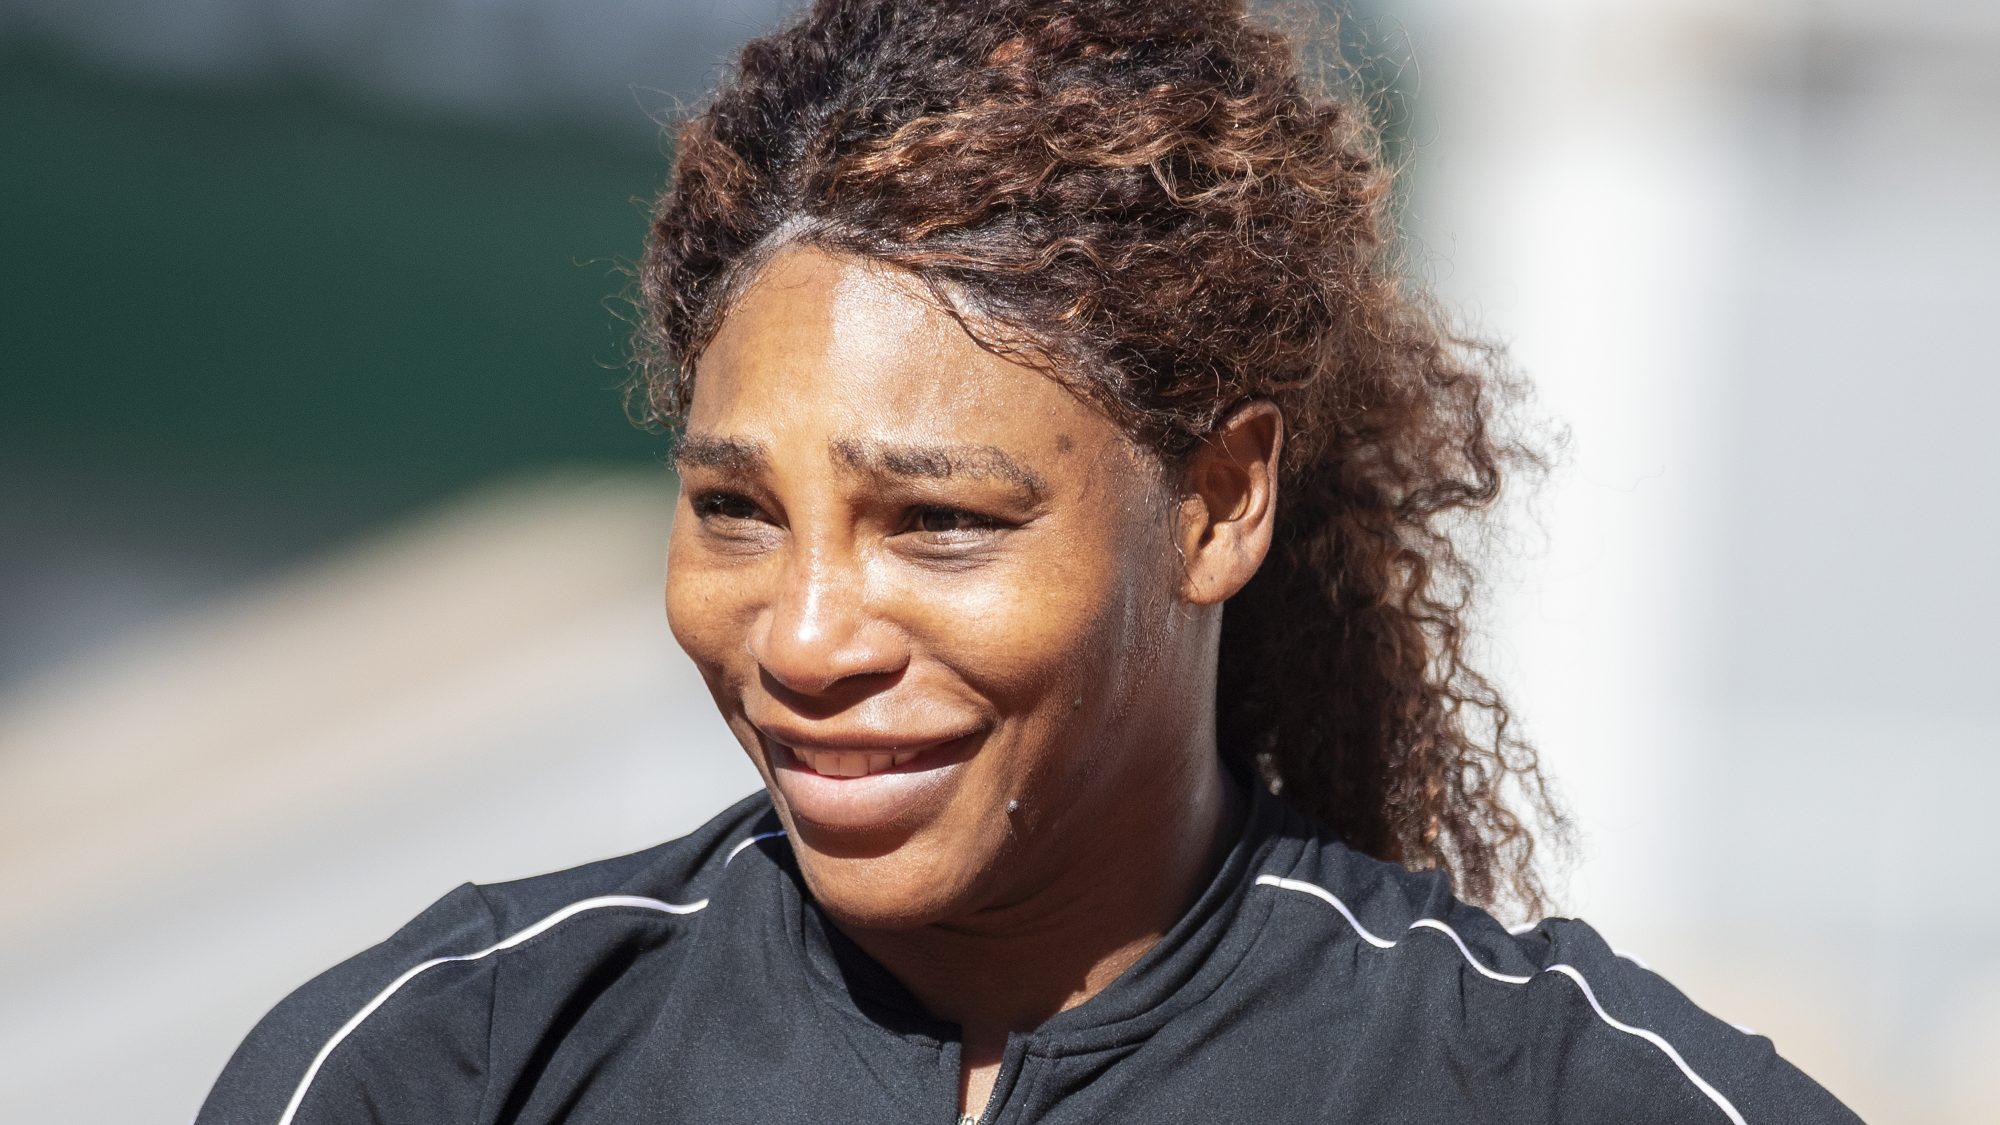 Serena Willliams